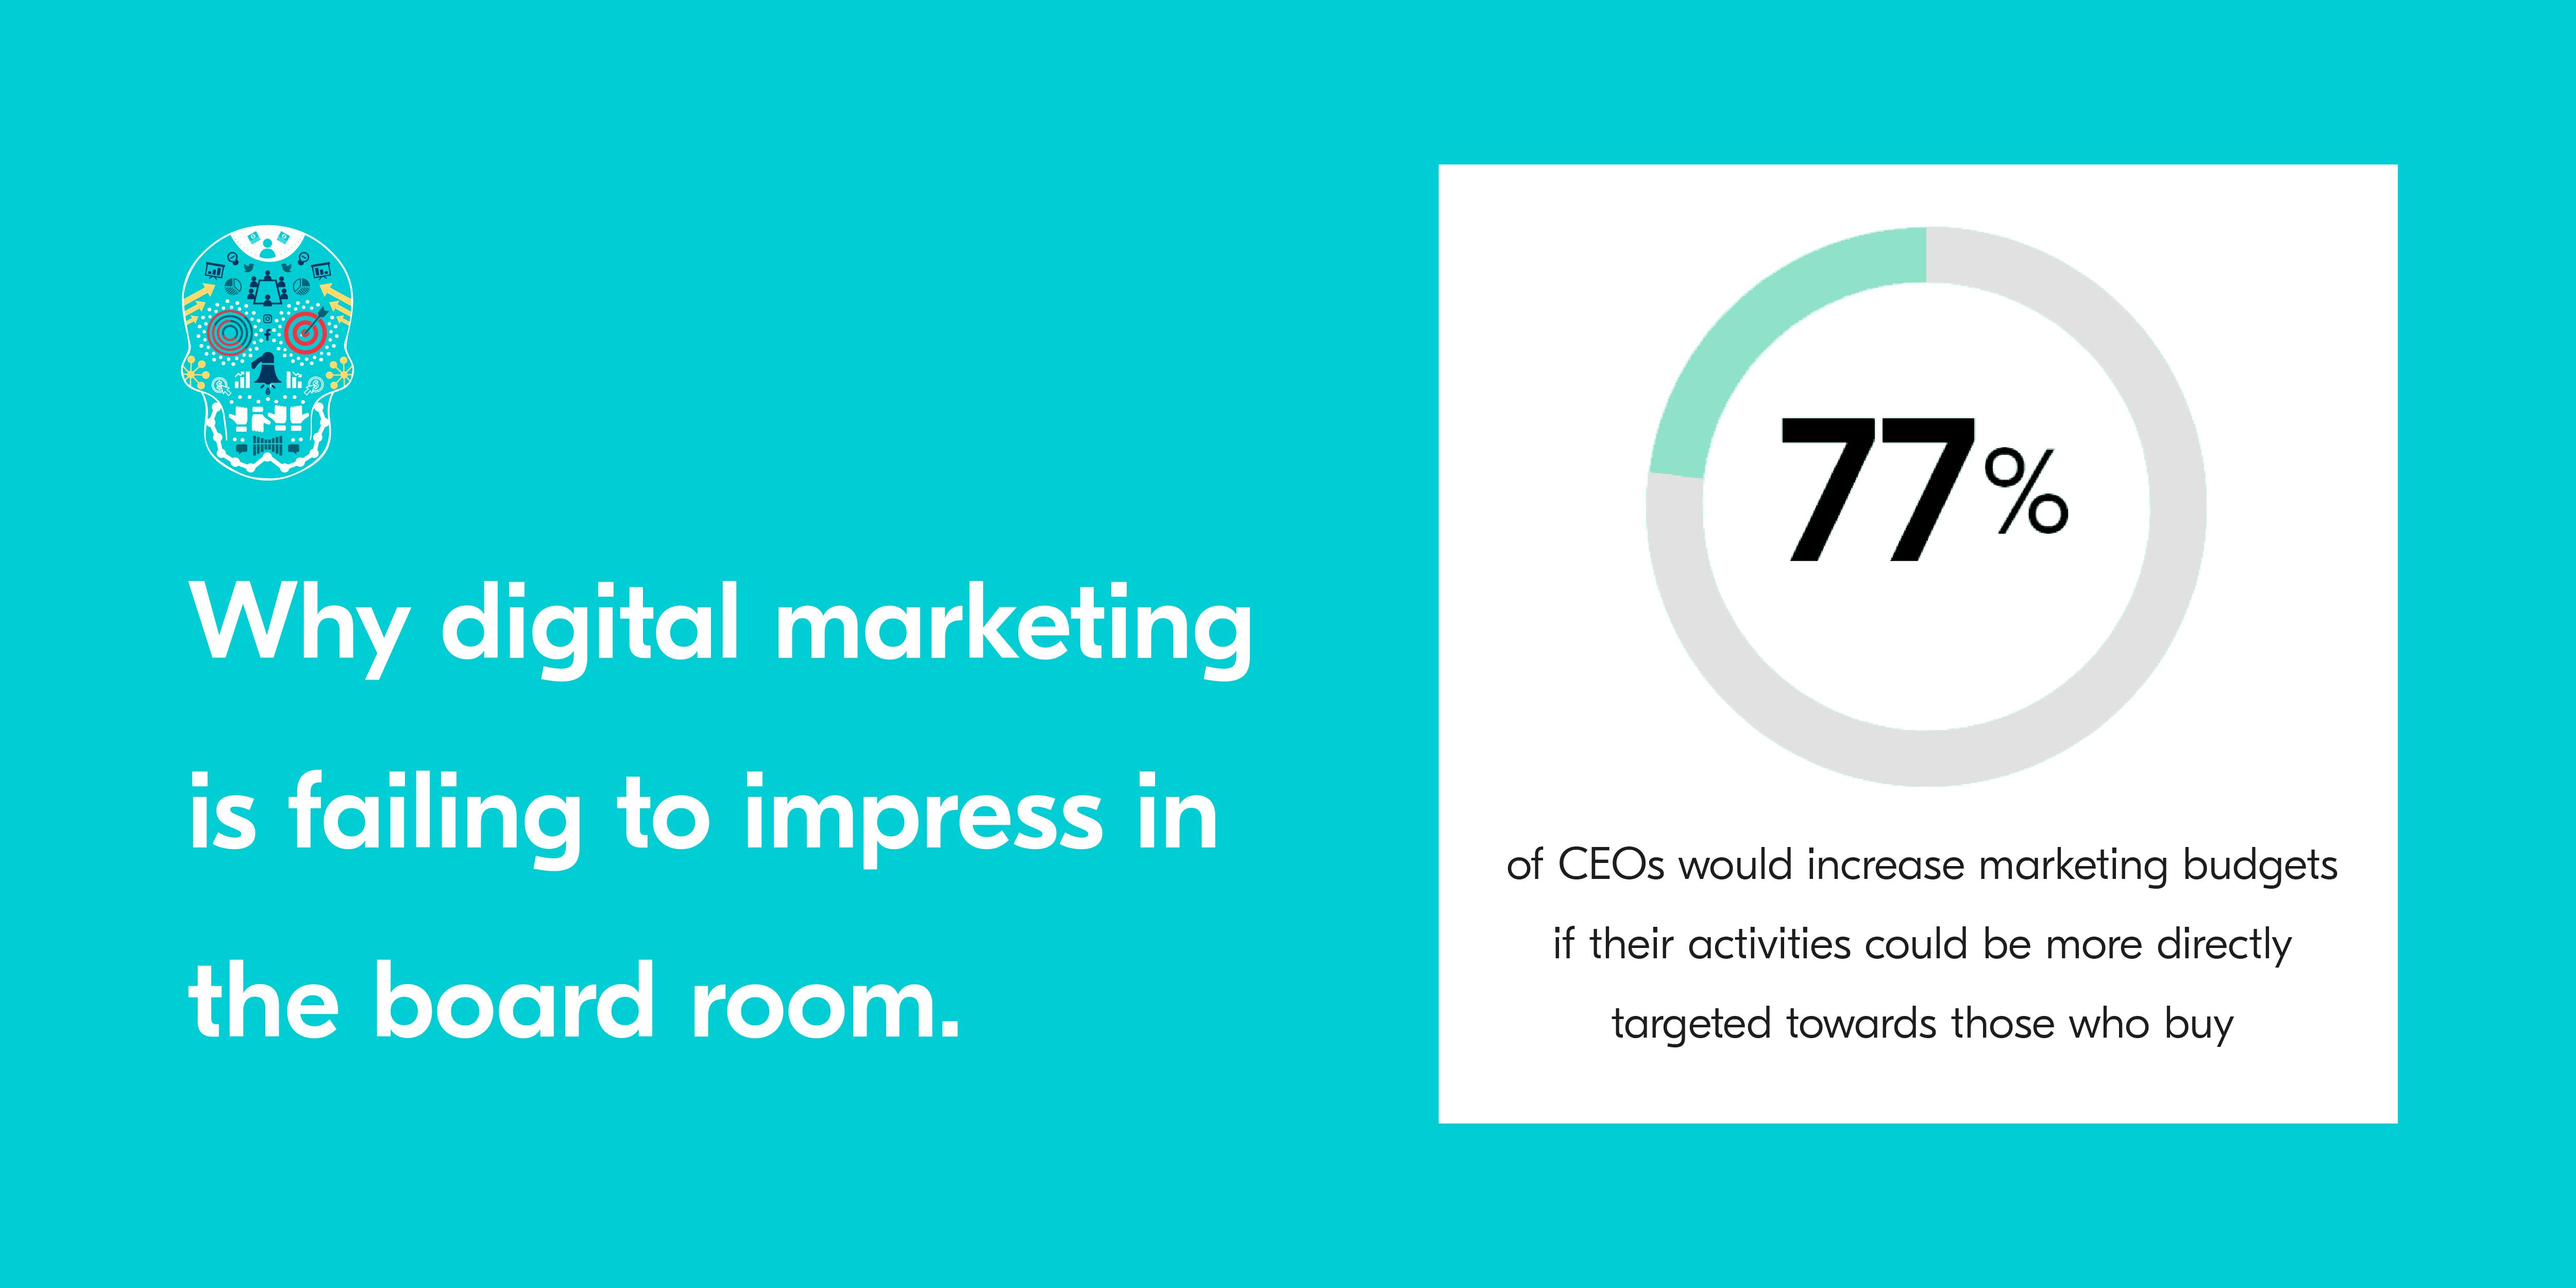 Board to Death: CEO's lose faith in social marketing | Bango